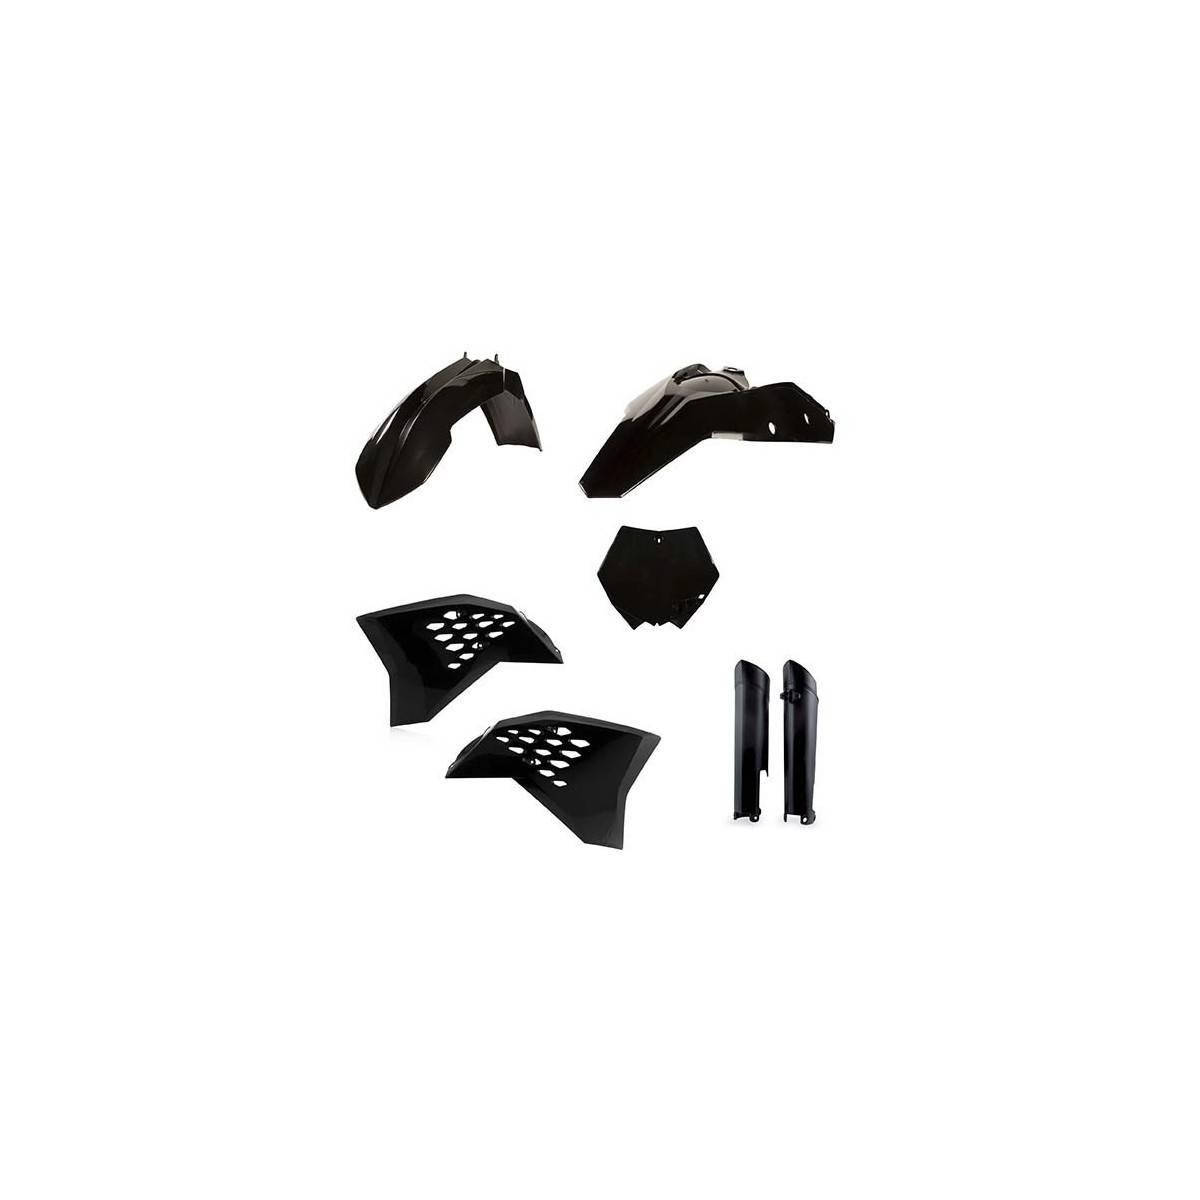 0022531-090 - Full Kit Plasticos Crf450 17 18 Negro